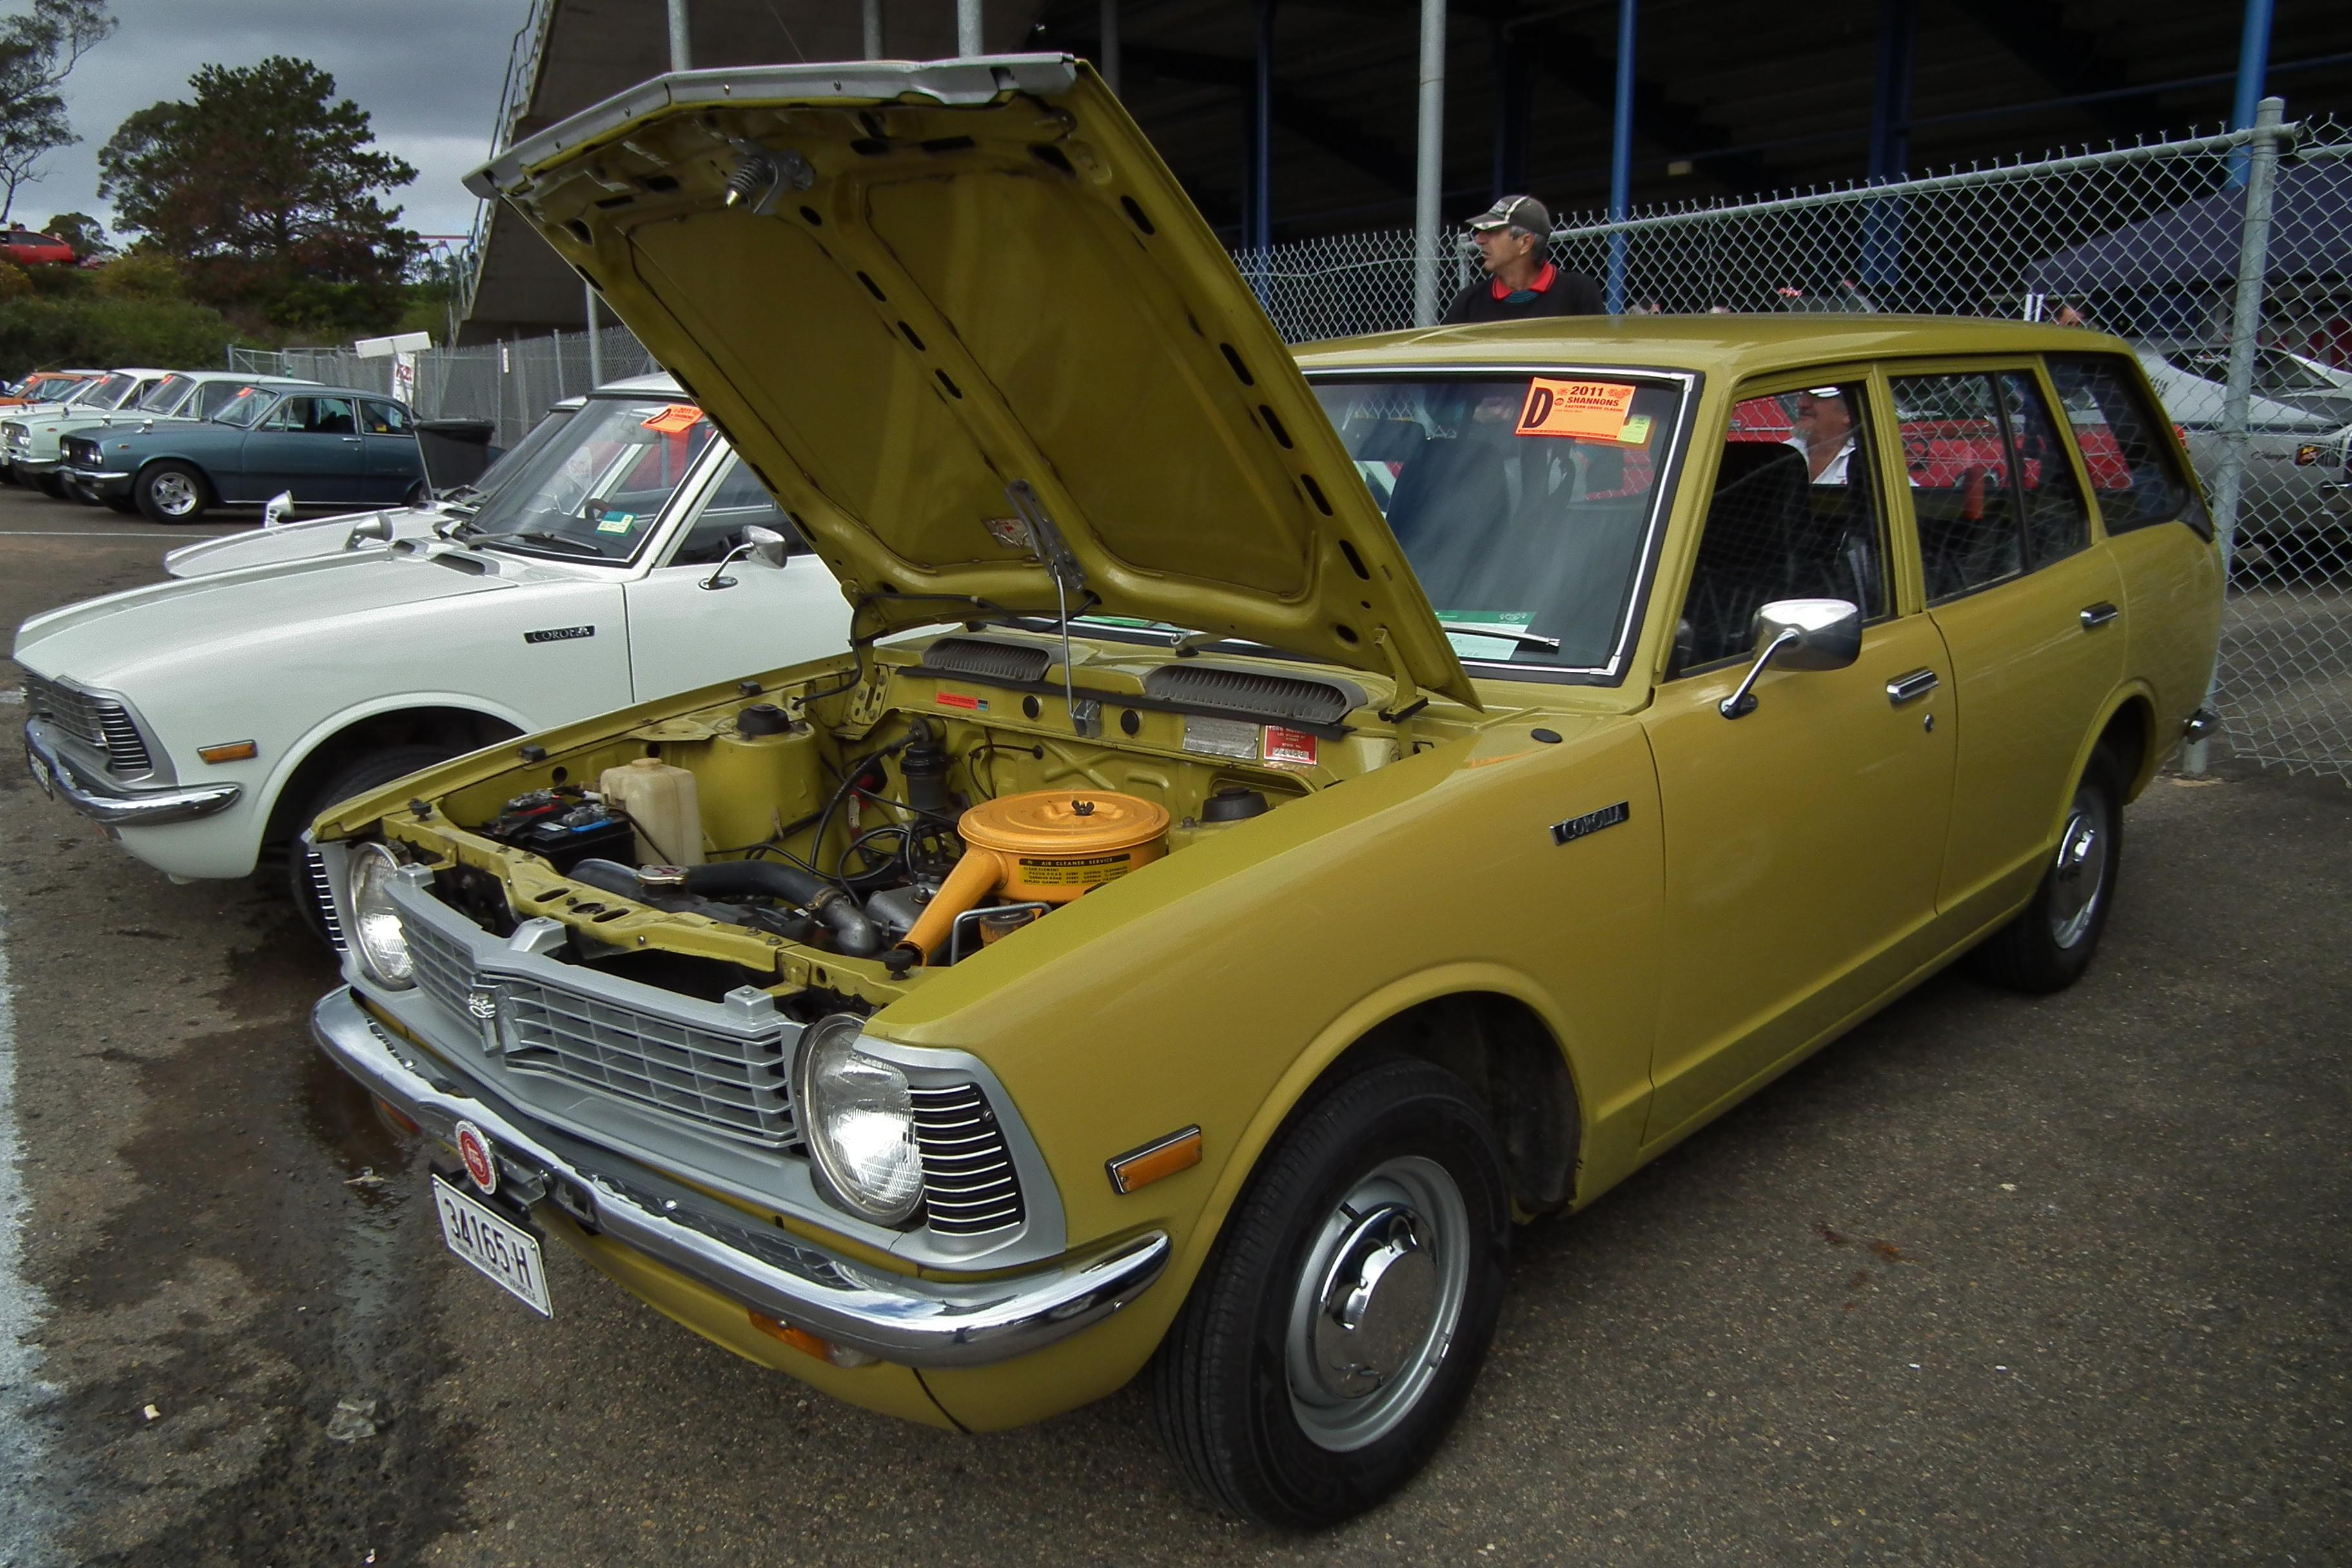 File 1973 Toyota Corolla Ke26 Station Wagon 6109403272 Jpg Wikimedia Commons